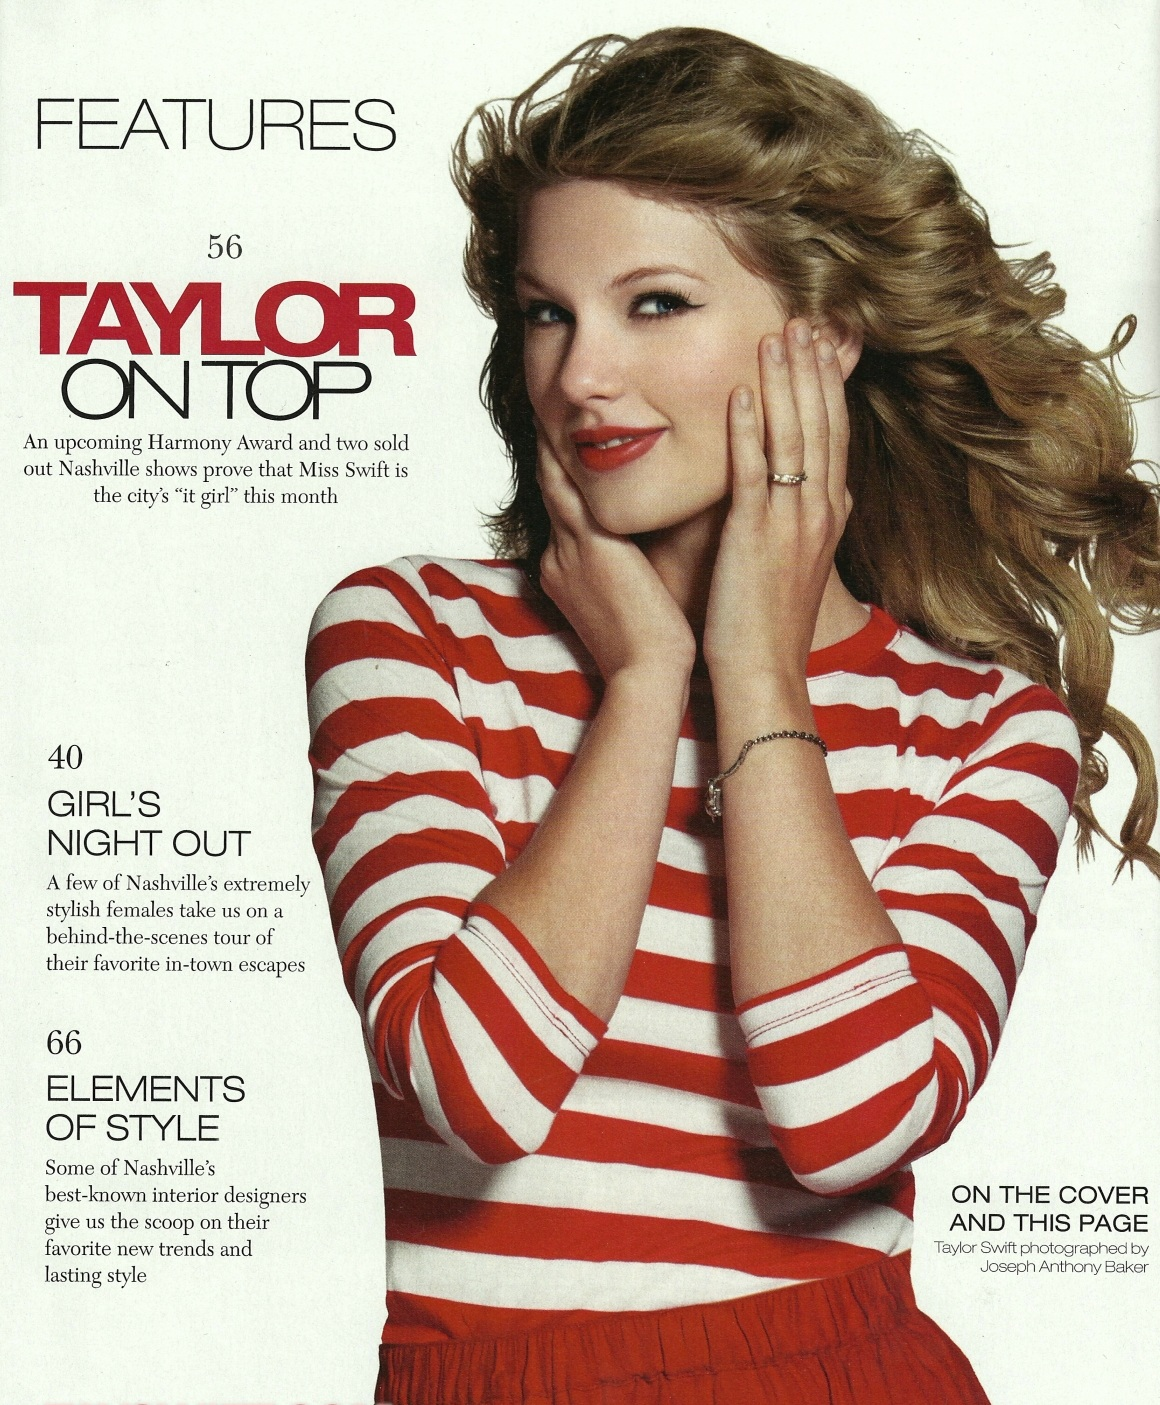 519236577_Taylor_Swift_Nashville_Lifestyles_September_2011_2_122_579lo.jpg